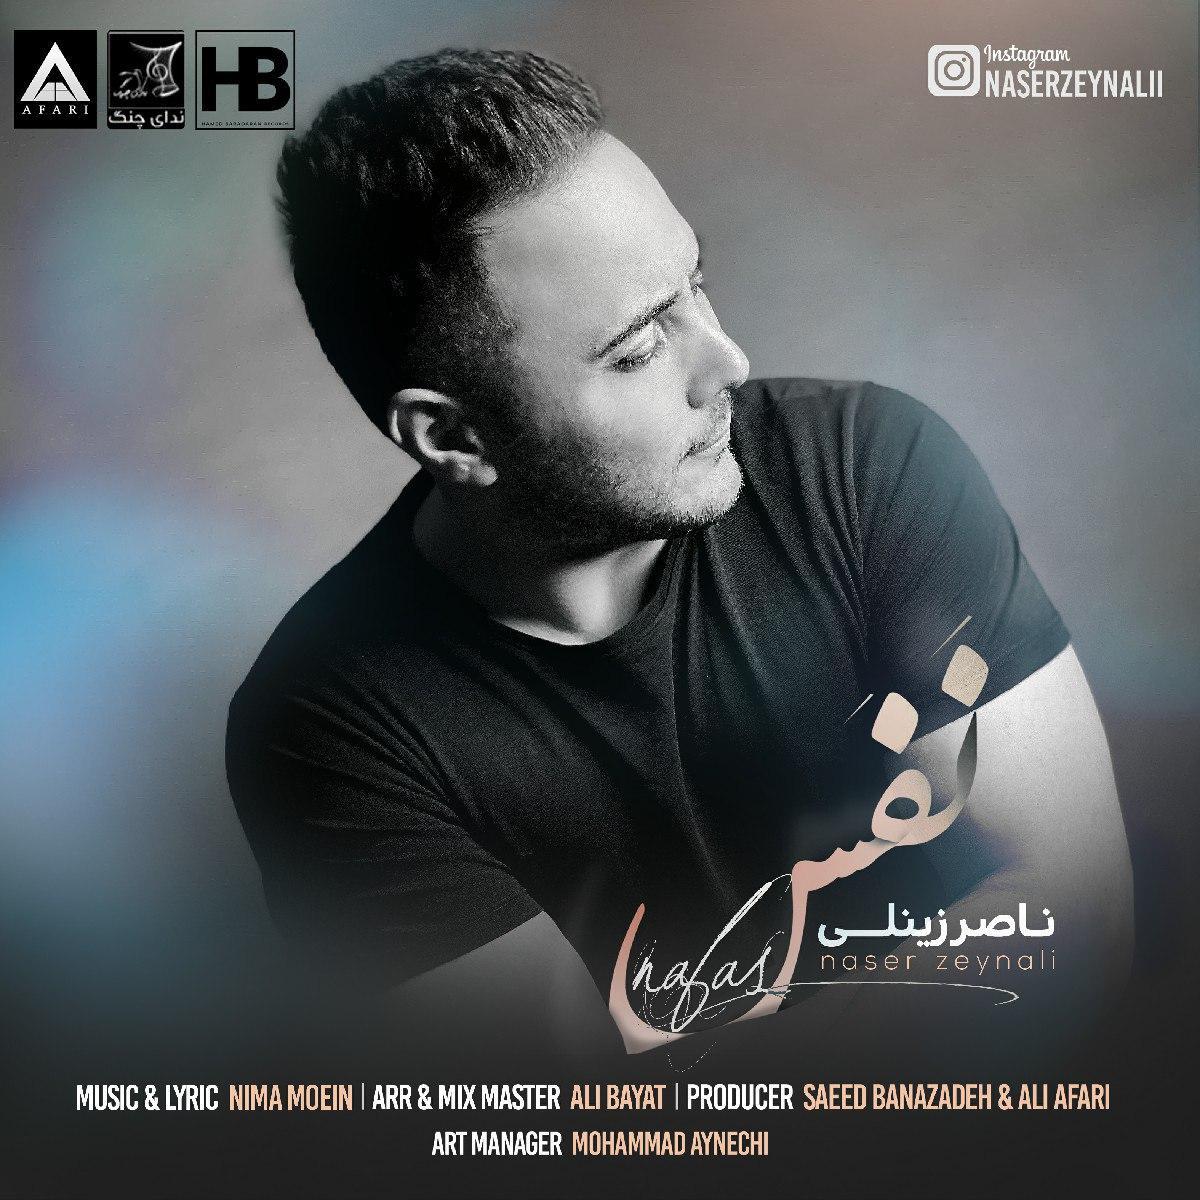 Naser Zeynali - Nafas - دانلود آهنگ ناصر زینعلی به نام نفس